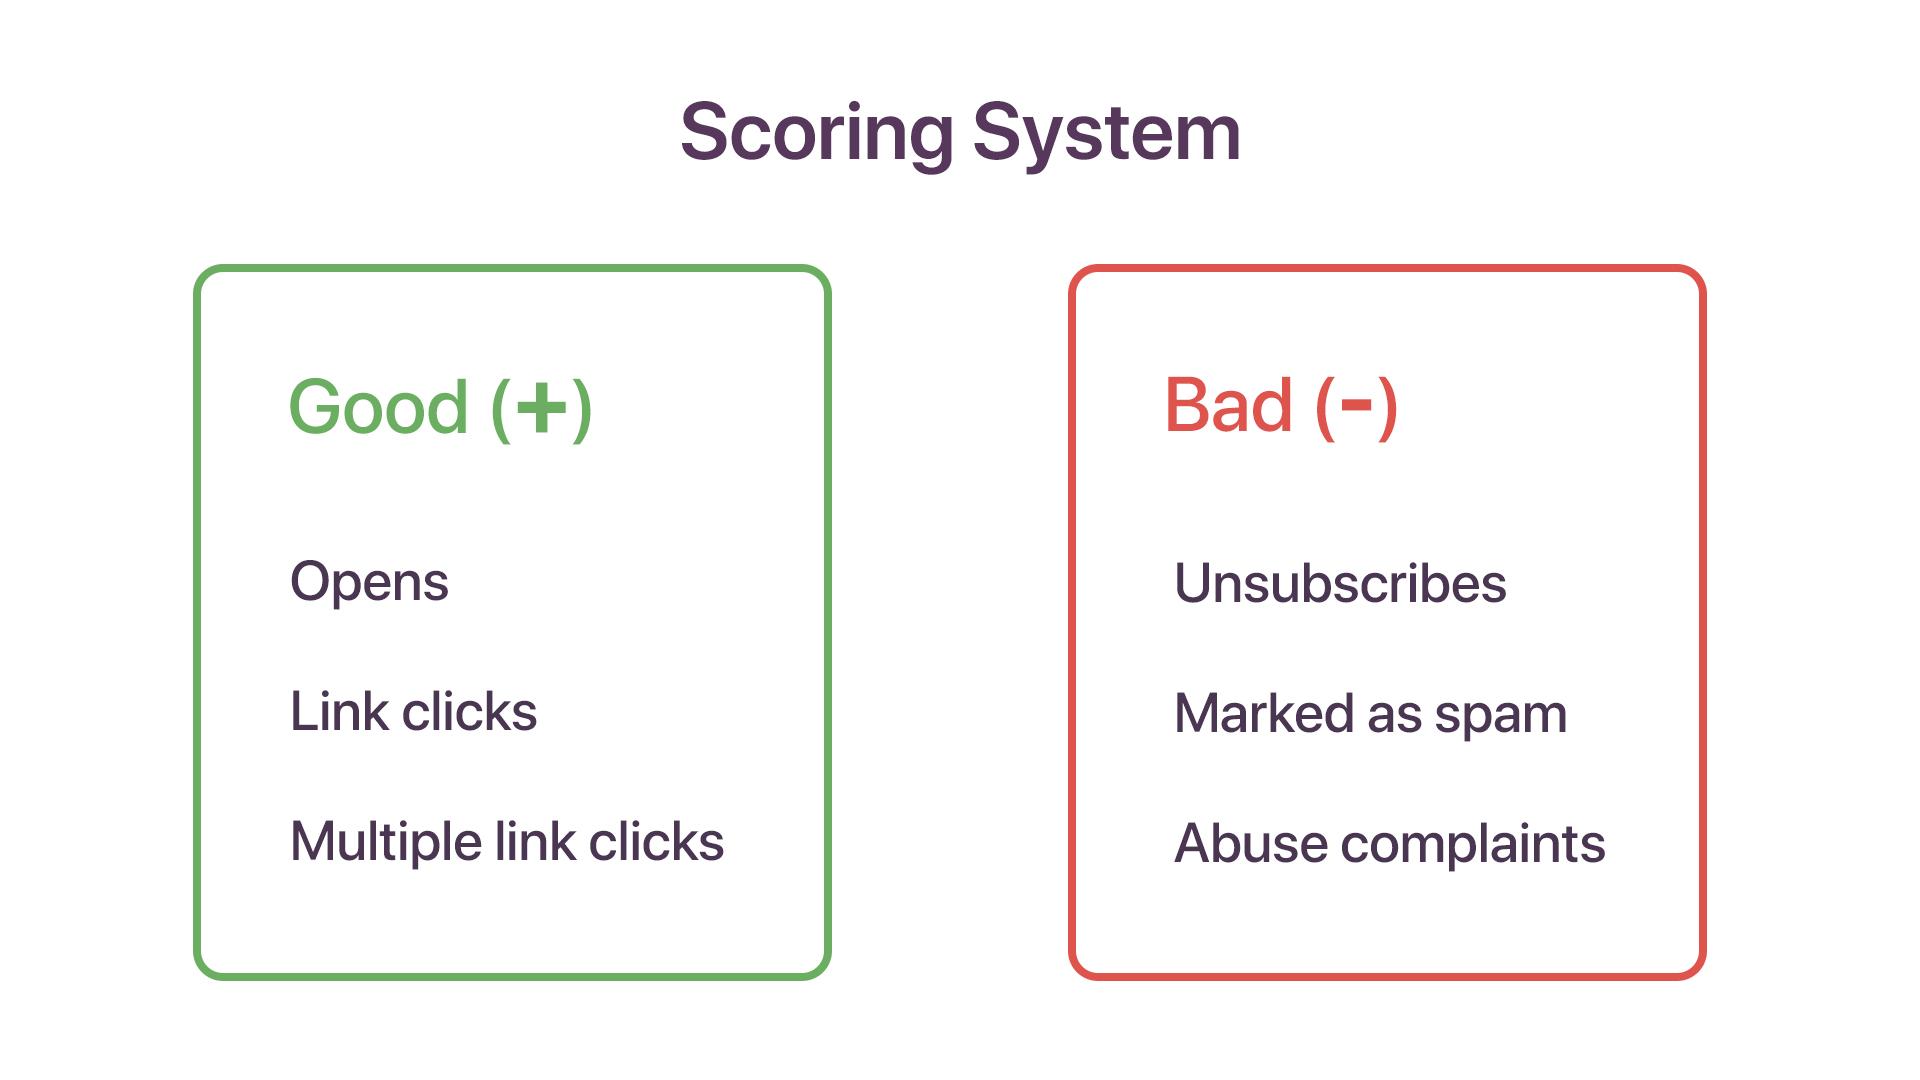 Scoring system of ISPs